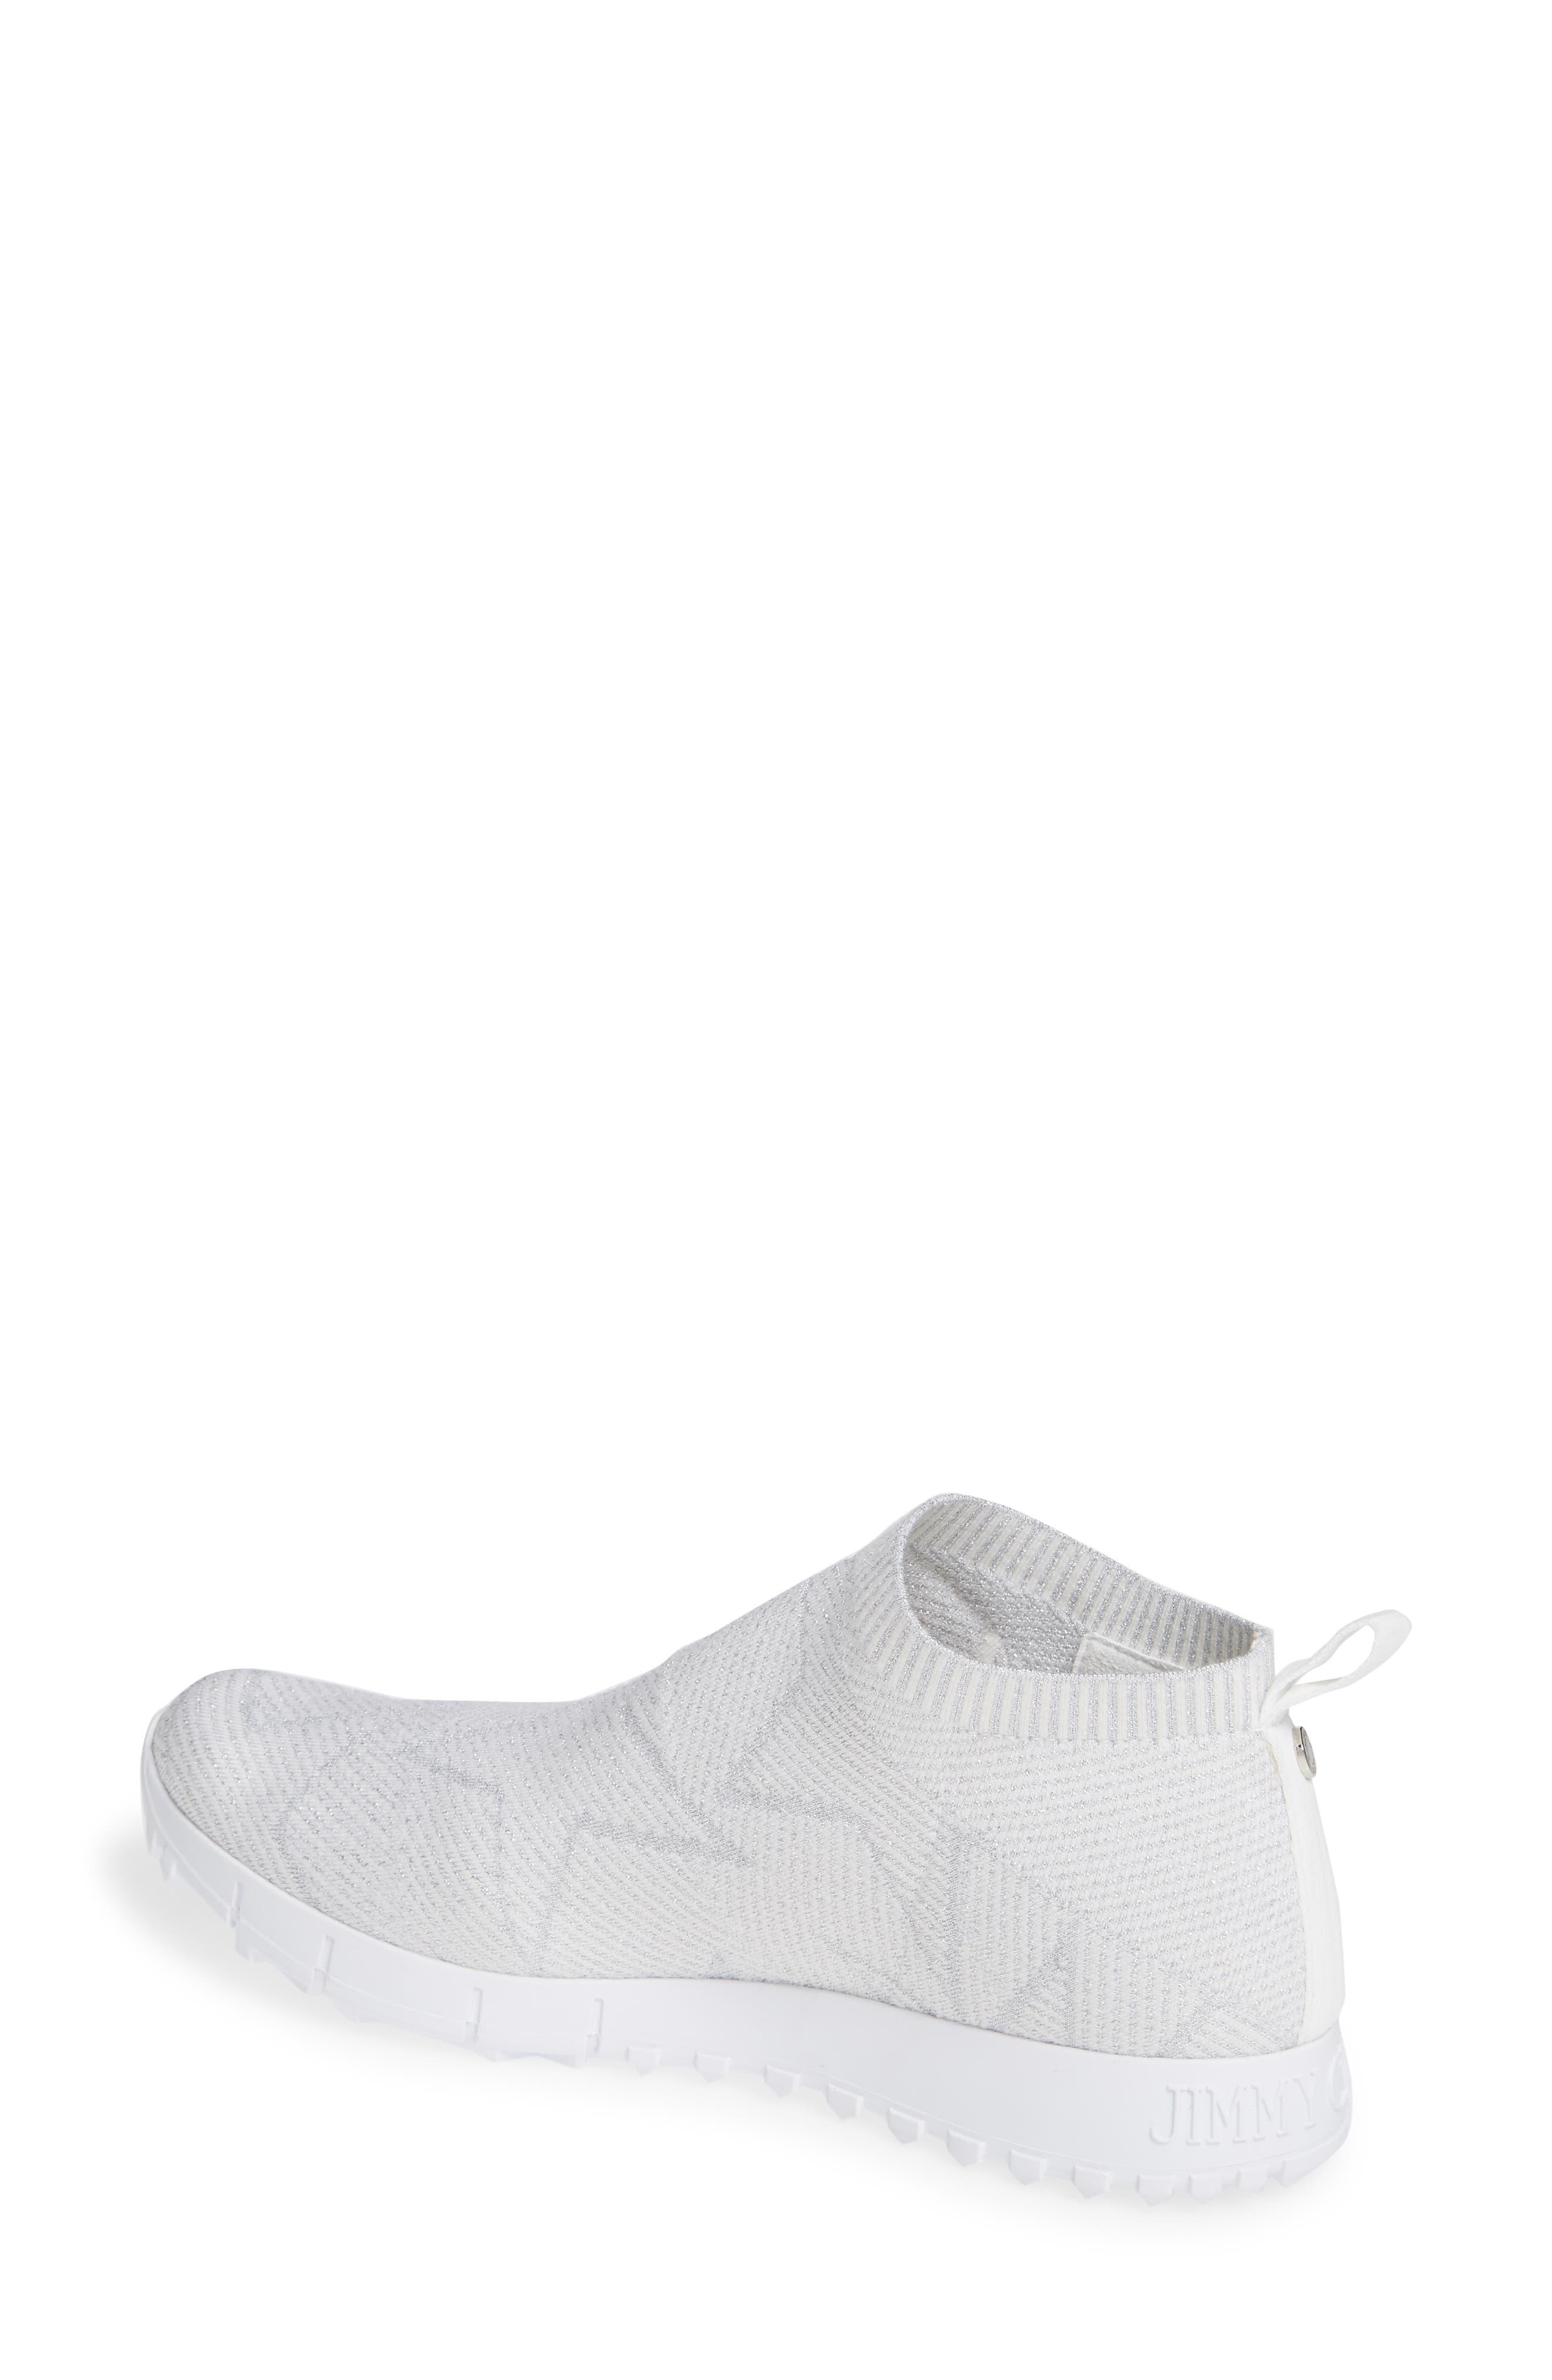 ced9cdc6d4de Women's Jimmy Choo Sneakers & Running Shoes | Nordstrom